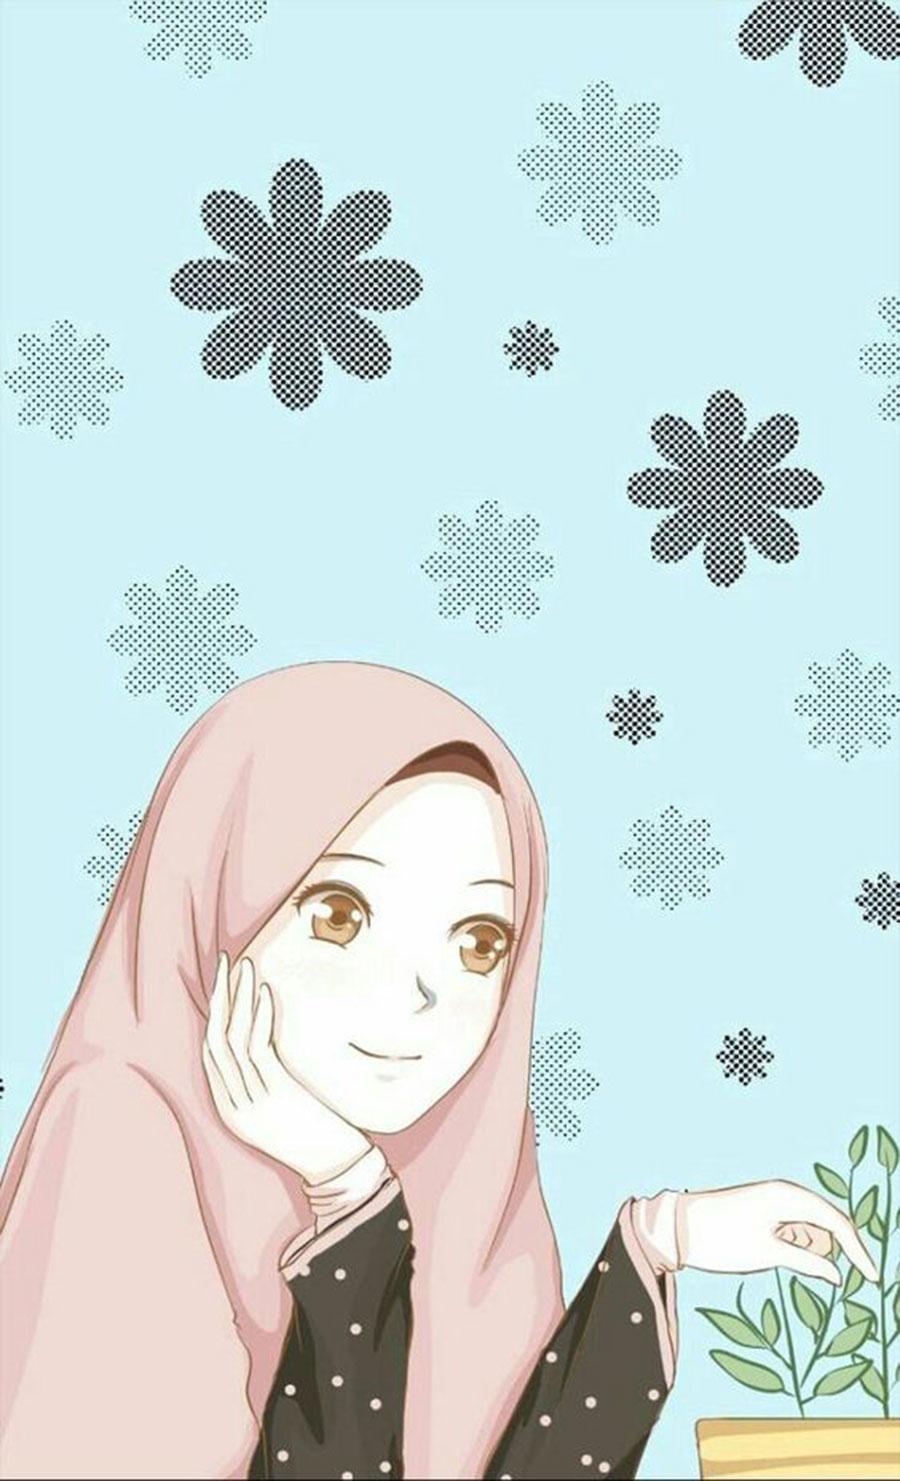 Free Anime Muslimah Wallpaper, Anime Muslimah Wallpaper Download ...